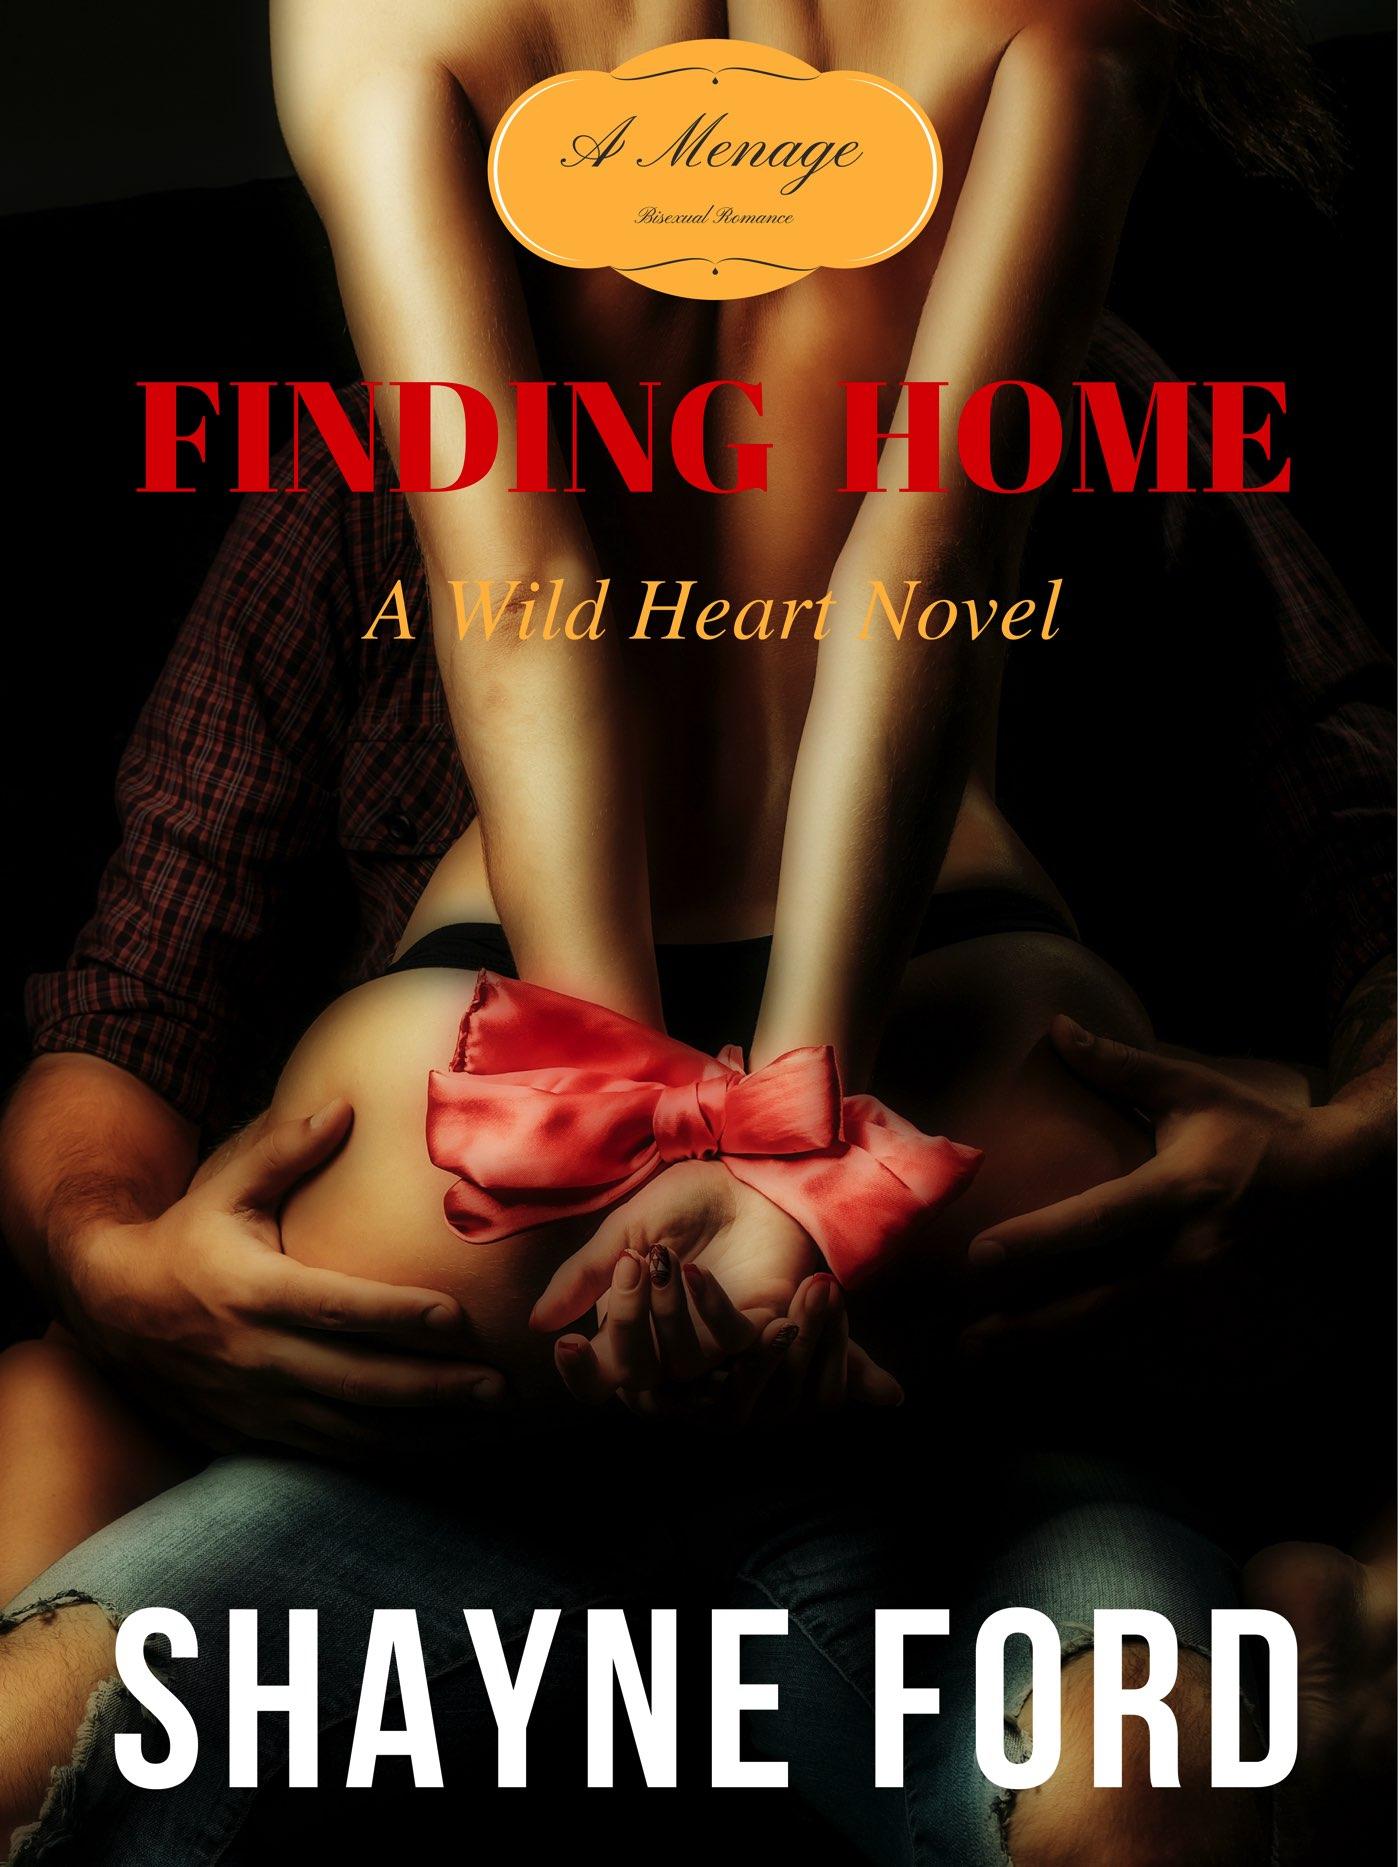 FINDING-HOME-Generic.jpg